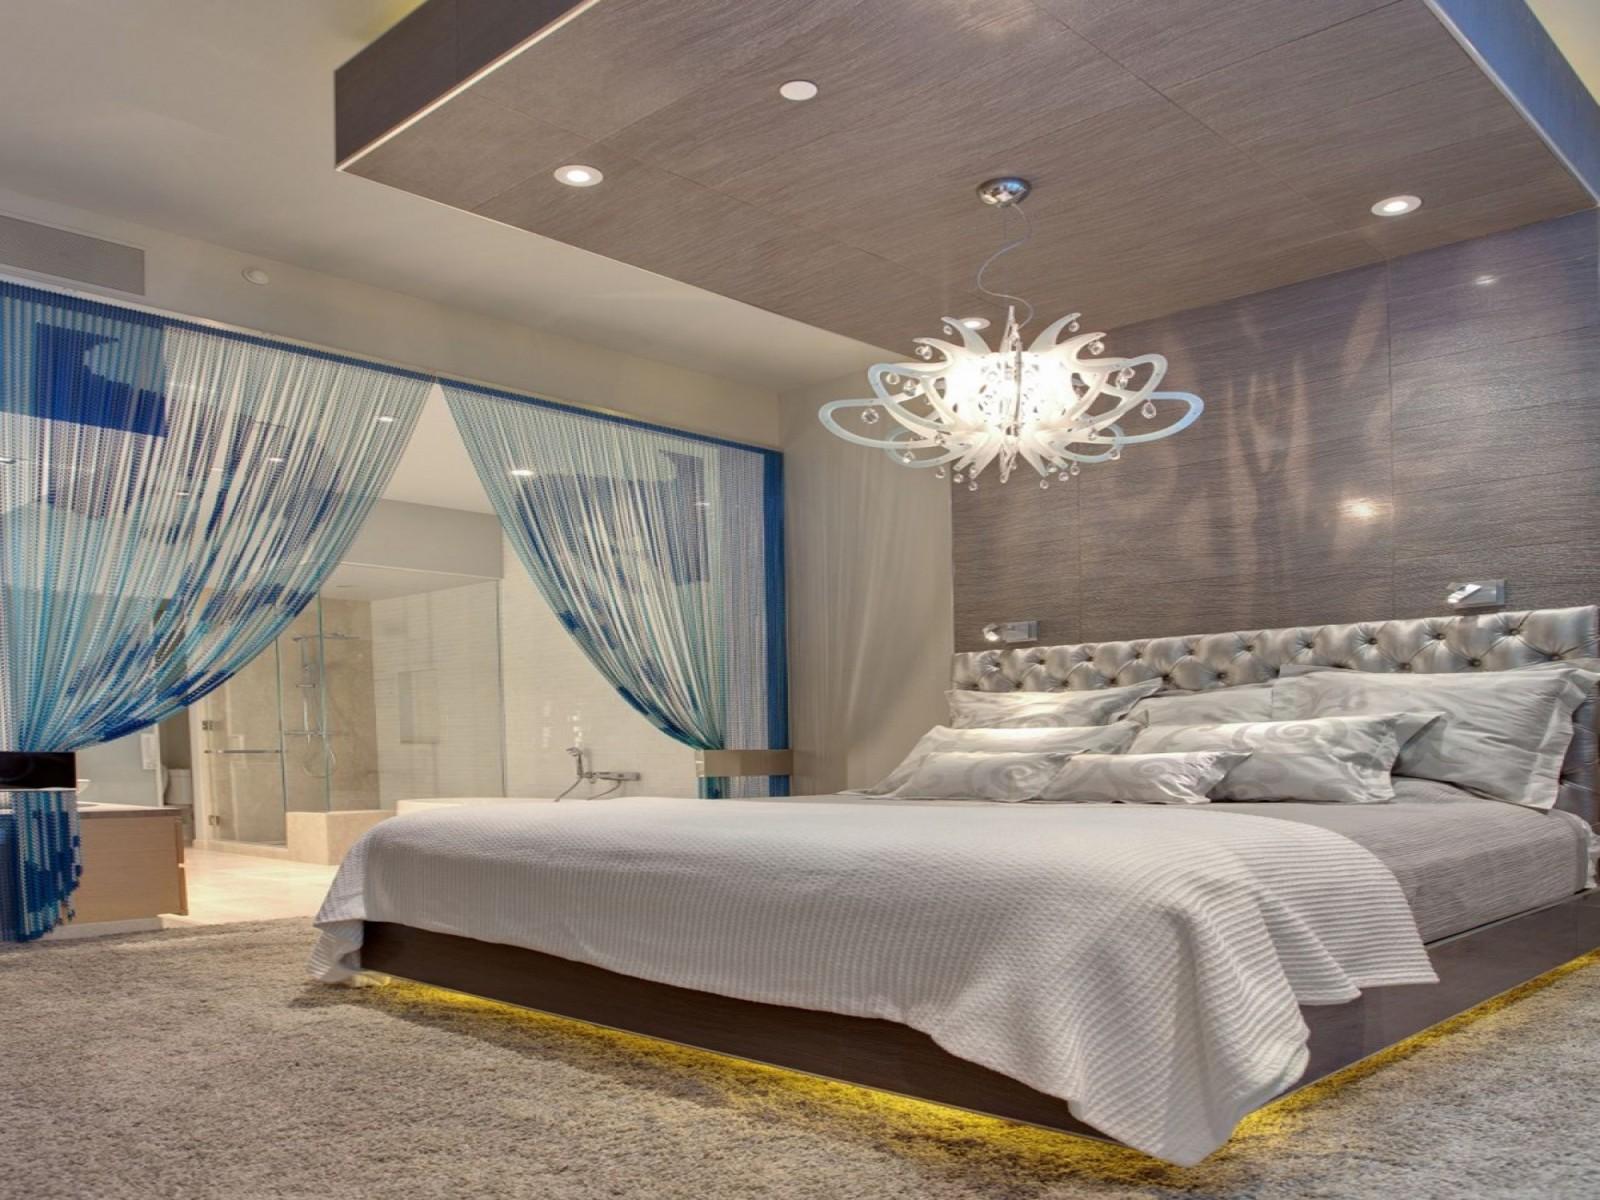 Adding Comfort To Your Bedroom Using Ceiling Bedroom Lights